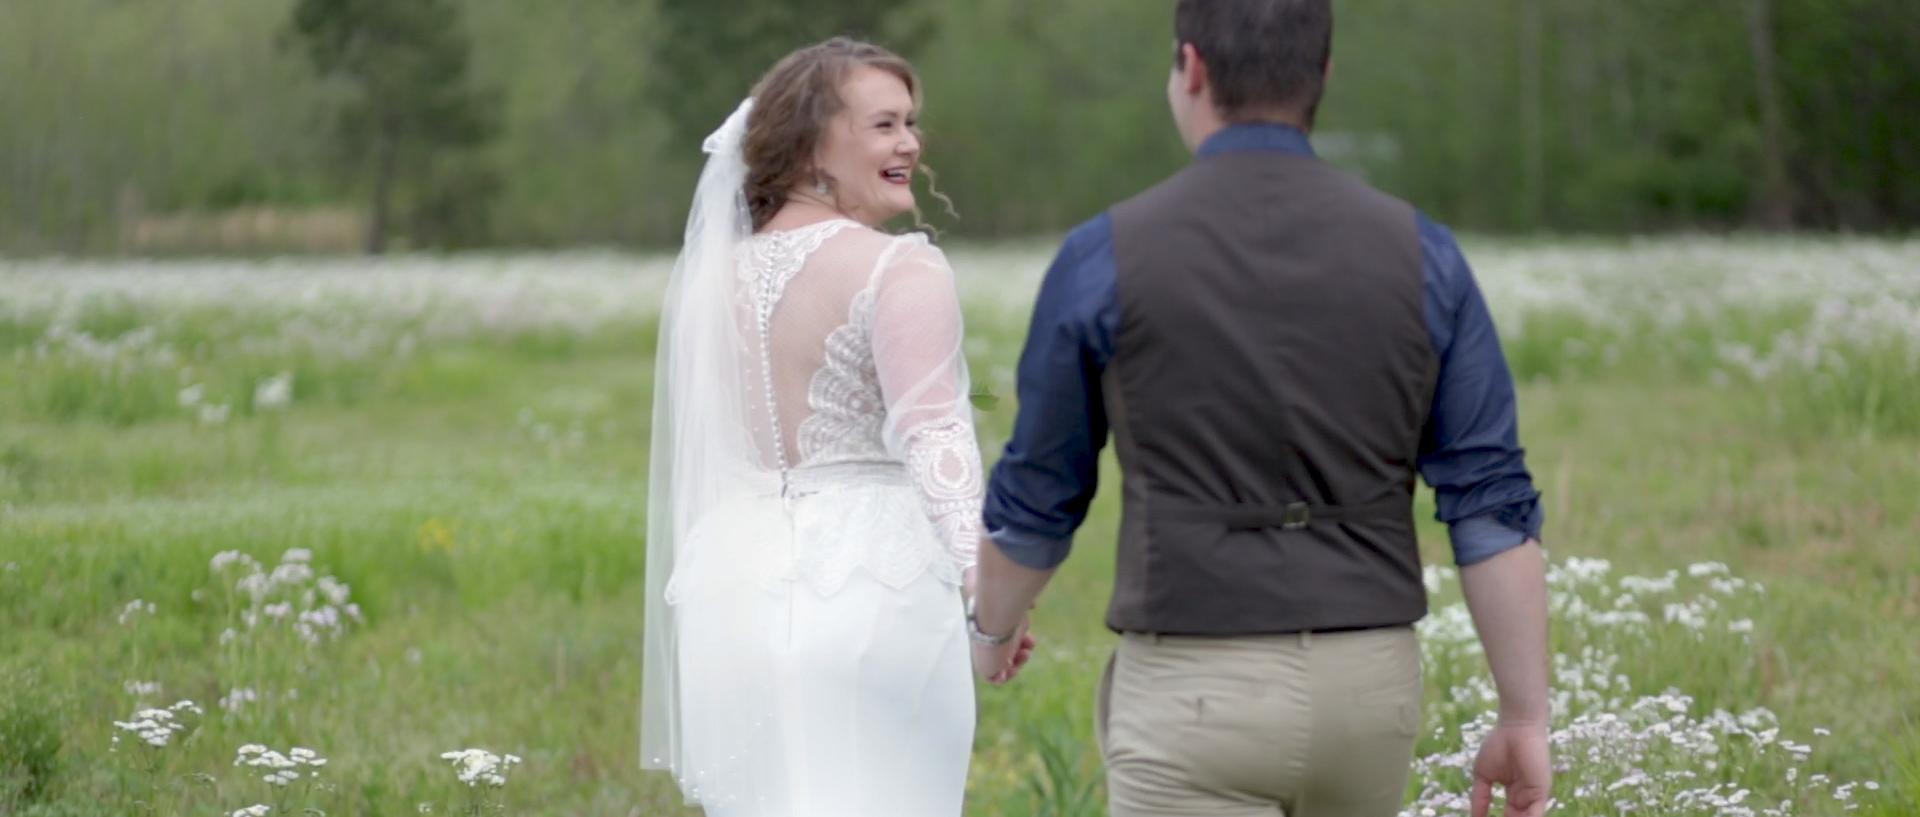 josee-corey-wedding-dress-photos-in-field-amavi-films-memphis-wedding-videographer.jpg